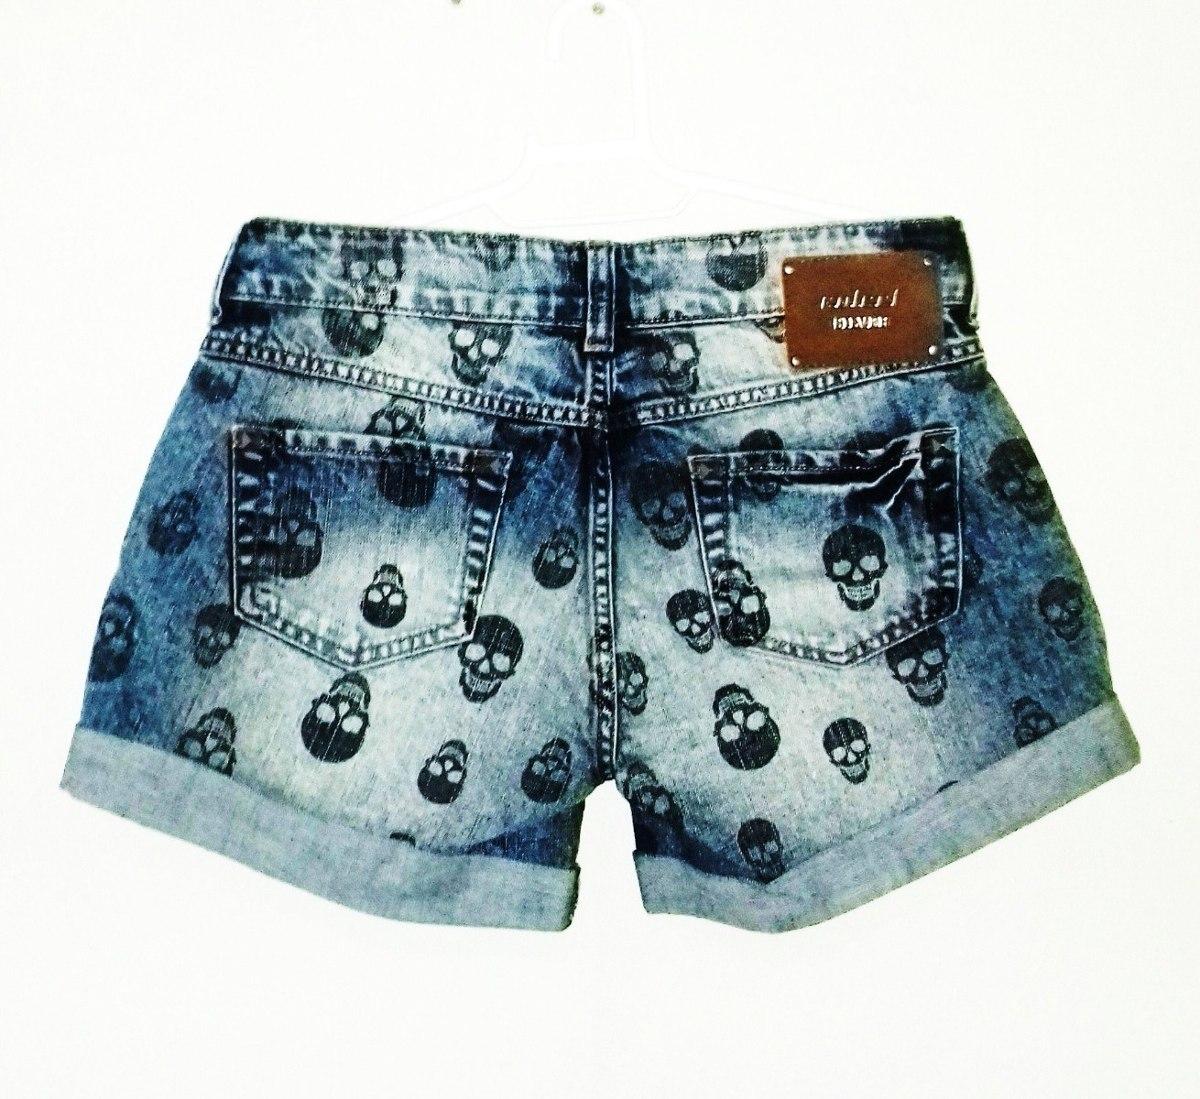 b2a72bc0a Short Jeans Feminina Colcci Silver Lab Tms 36 & 40 - R$ 199,00 em ...